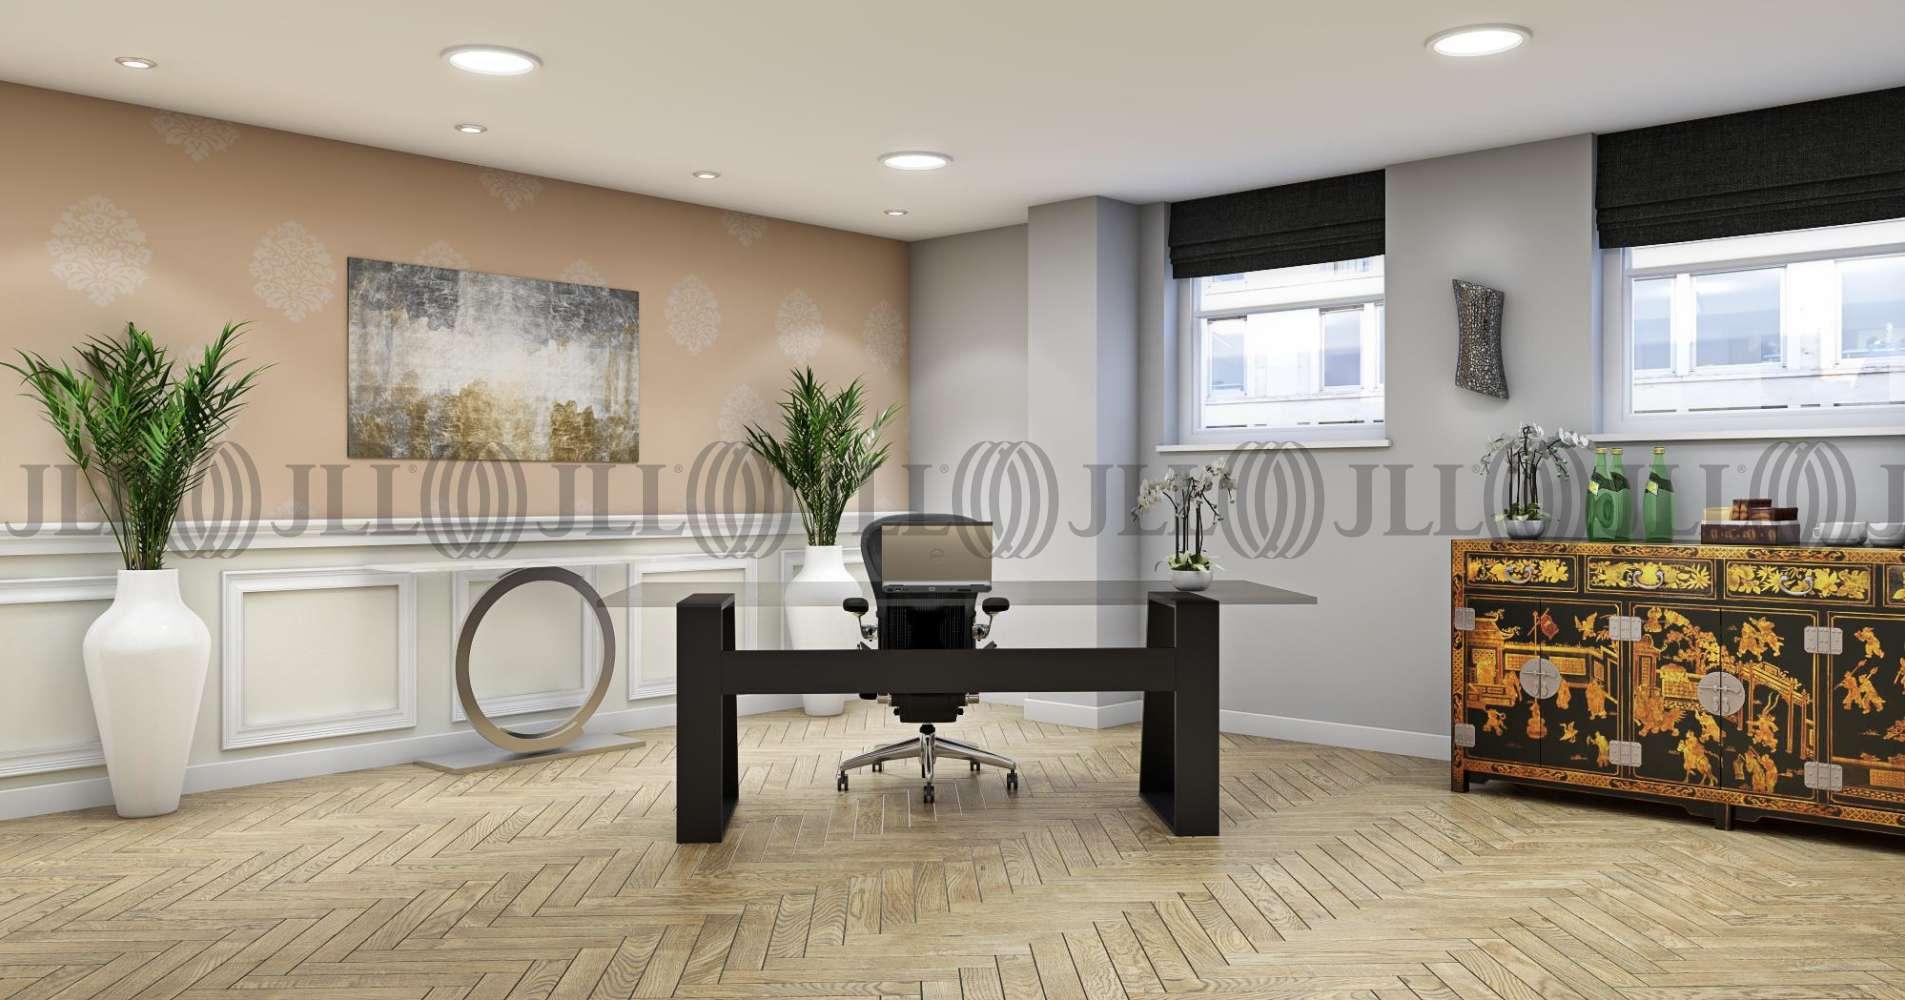 Serviced office London, EC3M 7UH  - Finsbury House  - 1